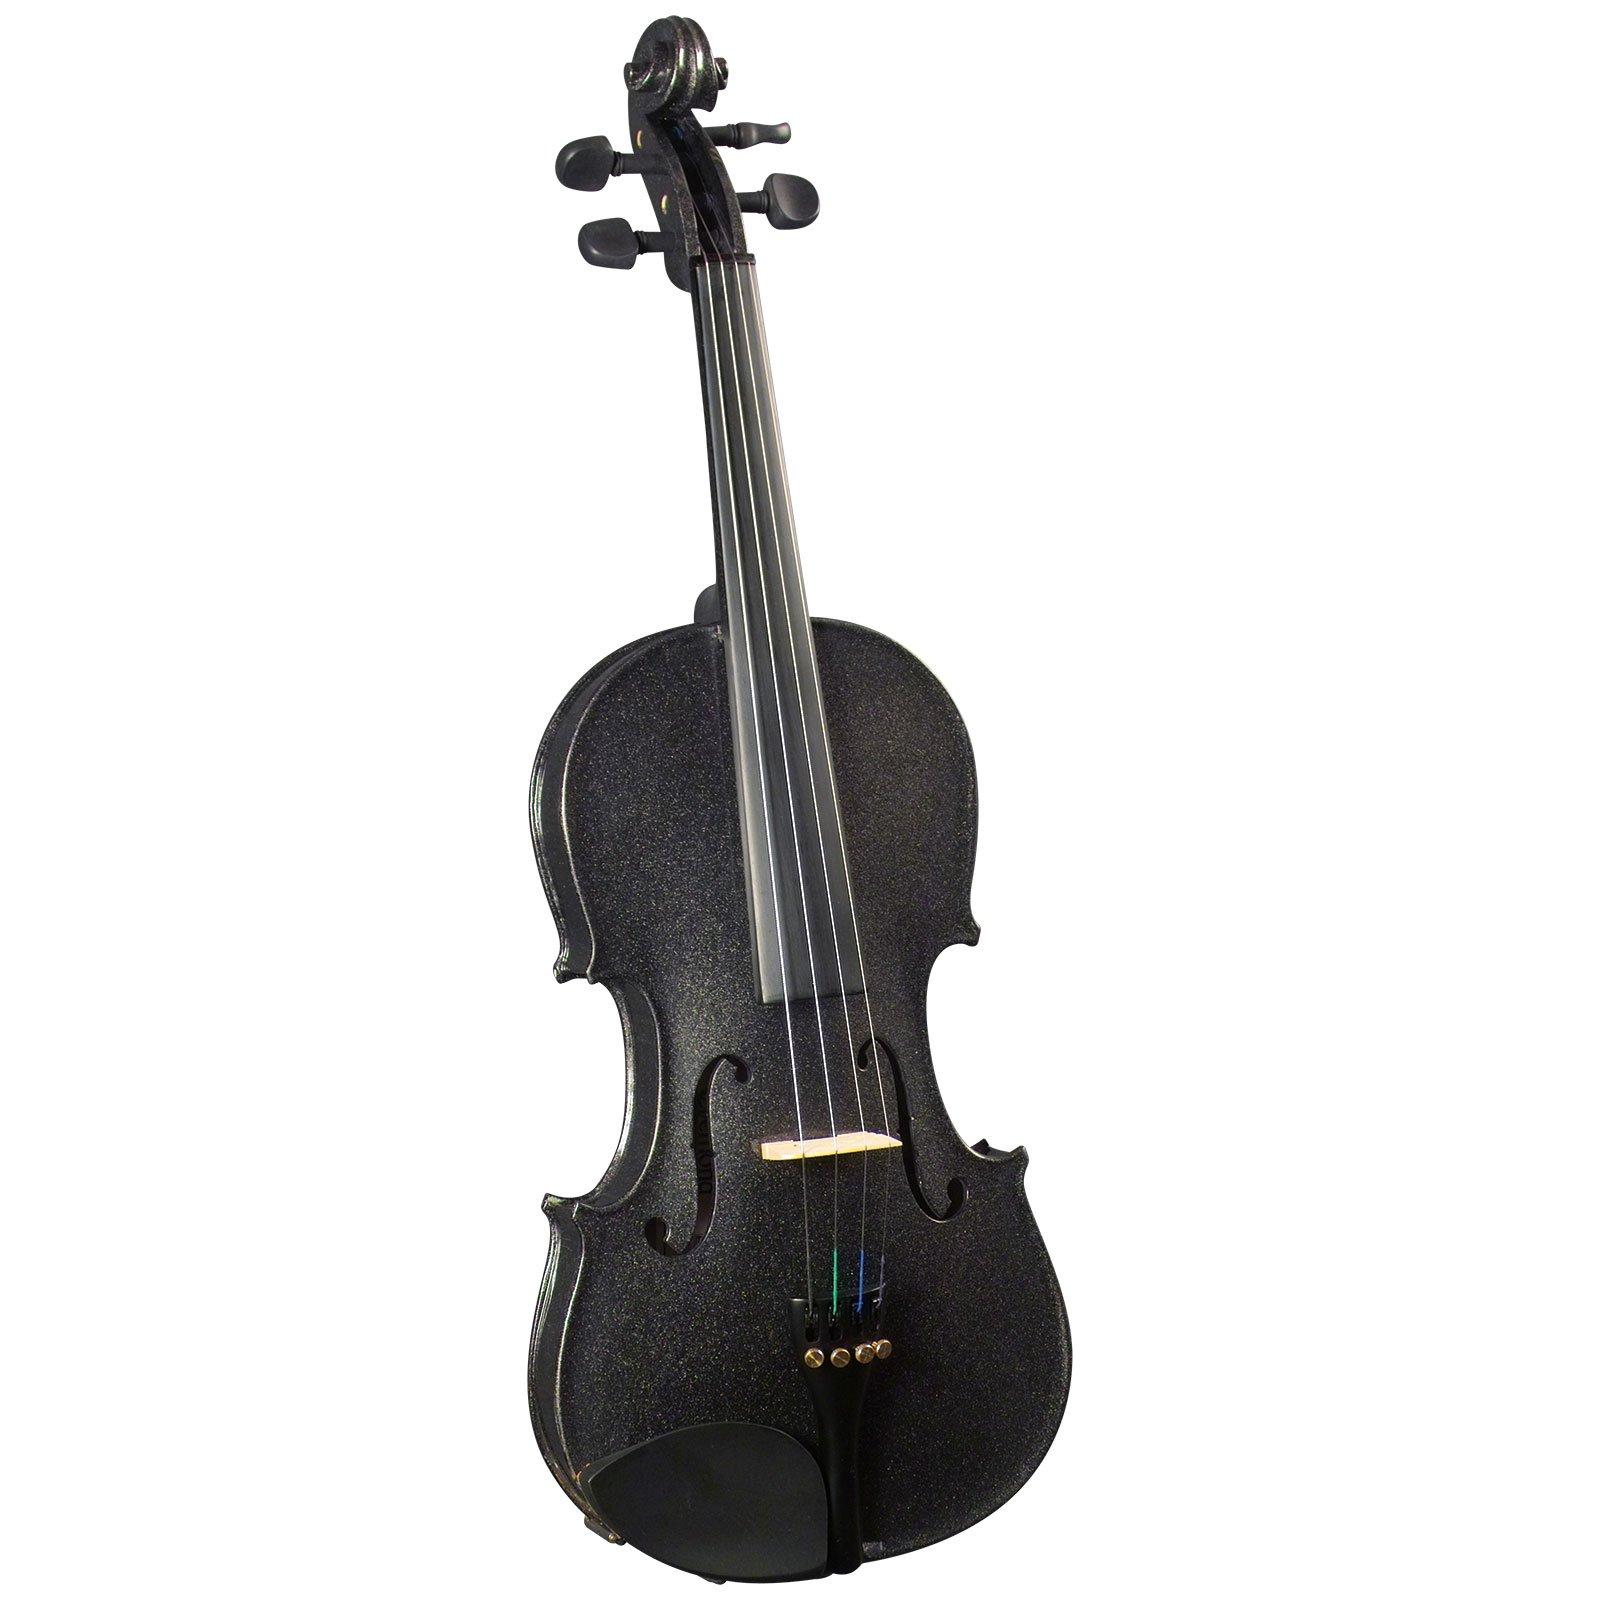 Cremona SV-130 Premier Novice Violin Outfit - Sparkling Black - 4/4 Size by Cremona